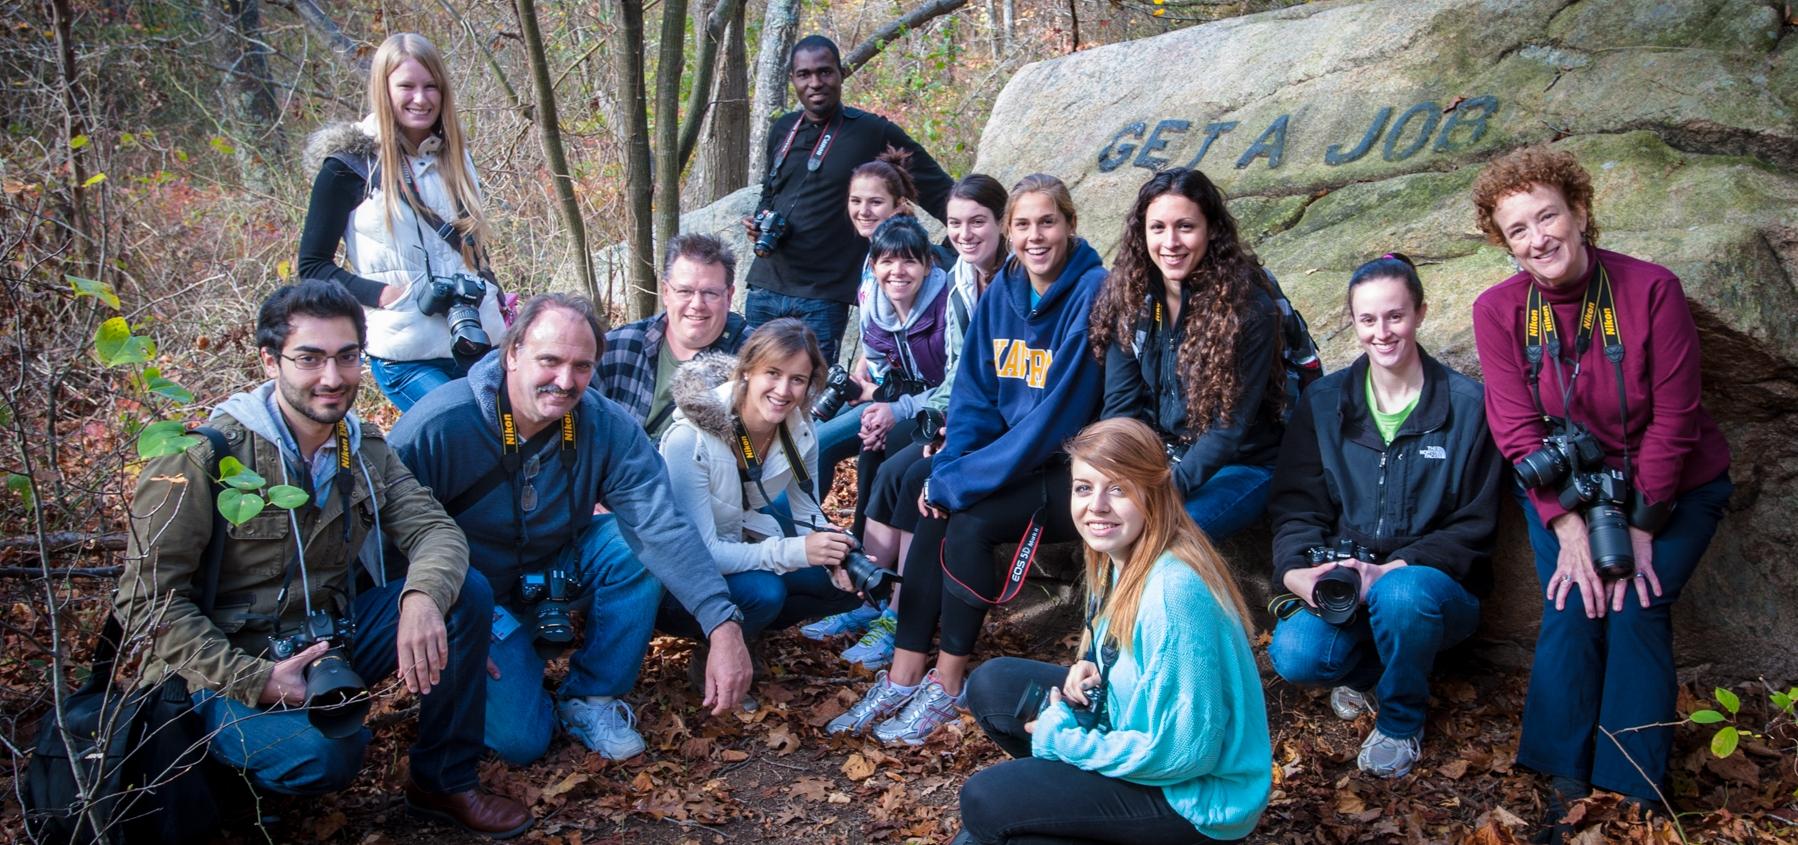 an impromptu class portrait taken on a field trip to photograph the Babson Rocks in Dogtown, near Gloucester, MA